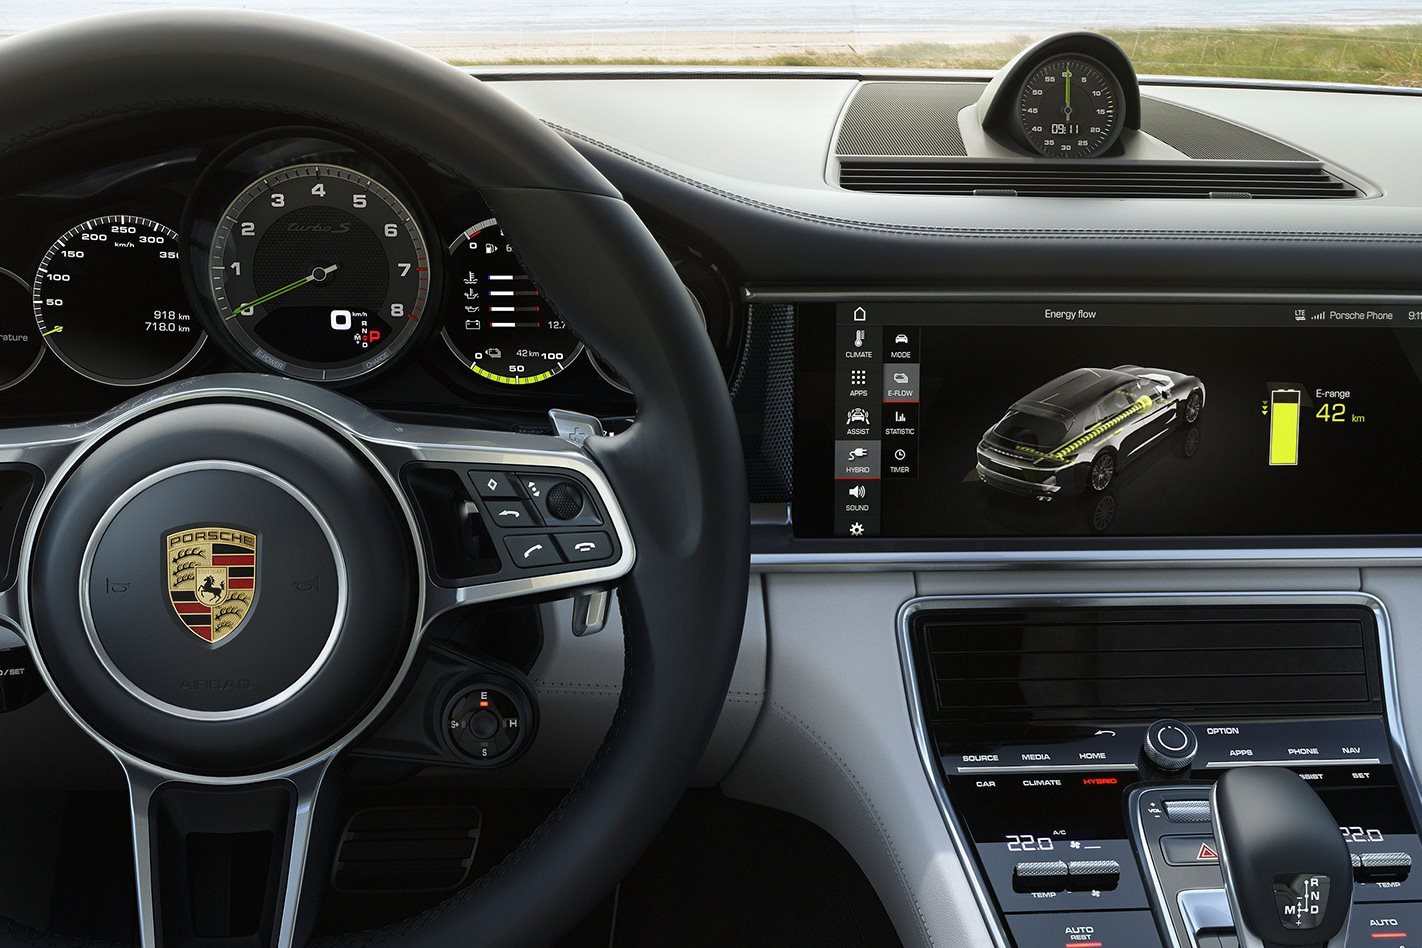 Porsche Turbo S E-Hybrid Sport wagon interior